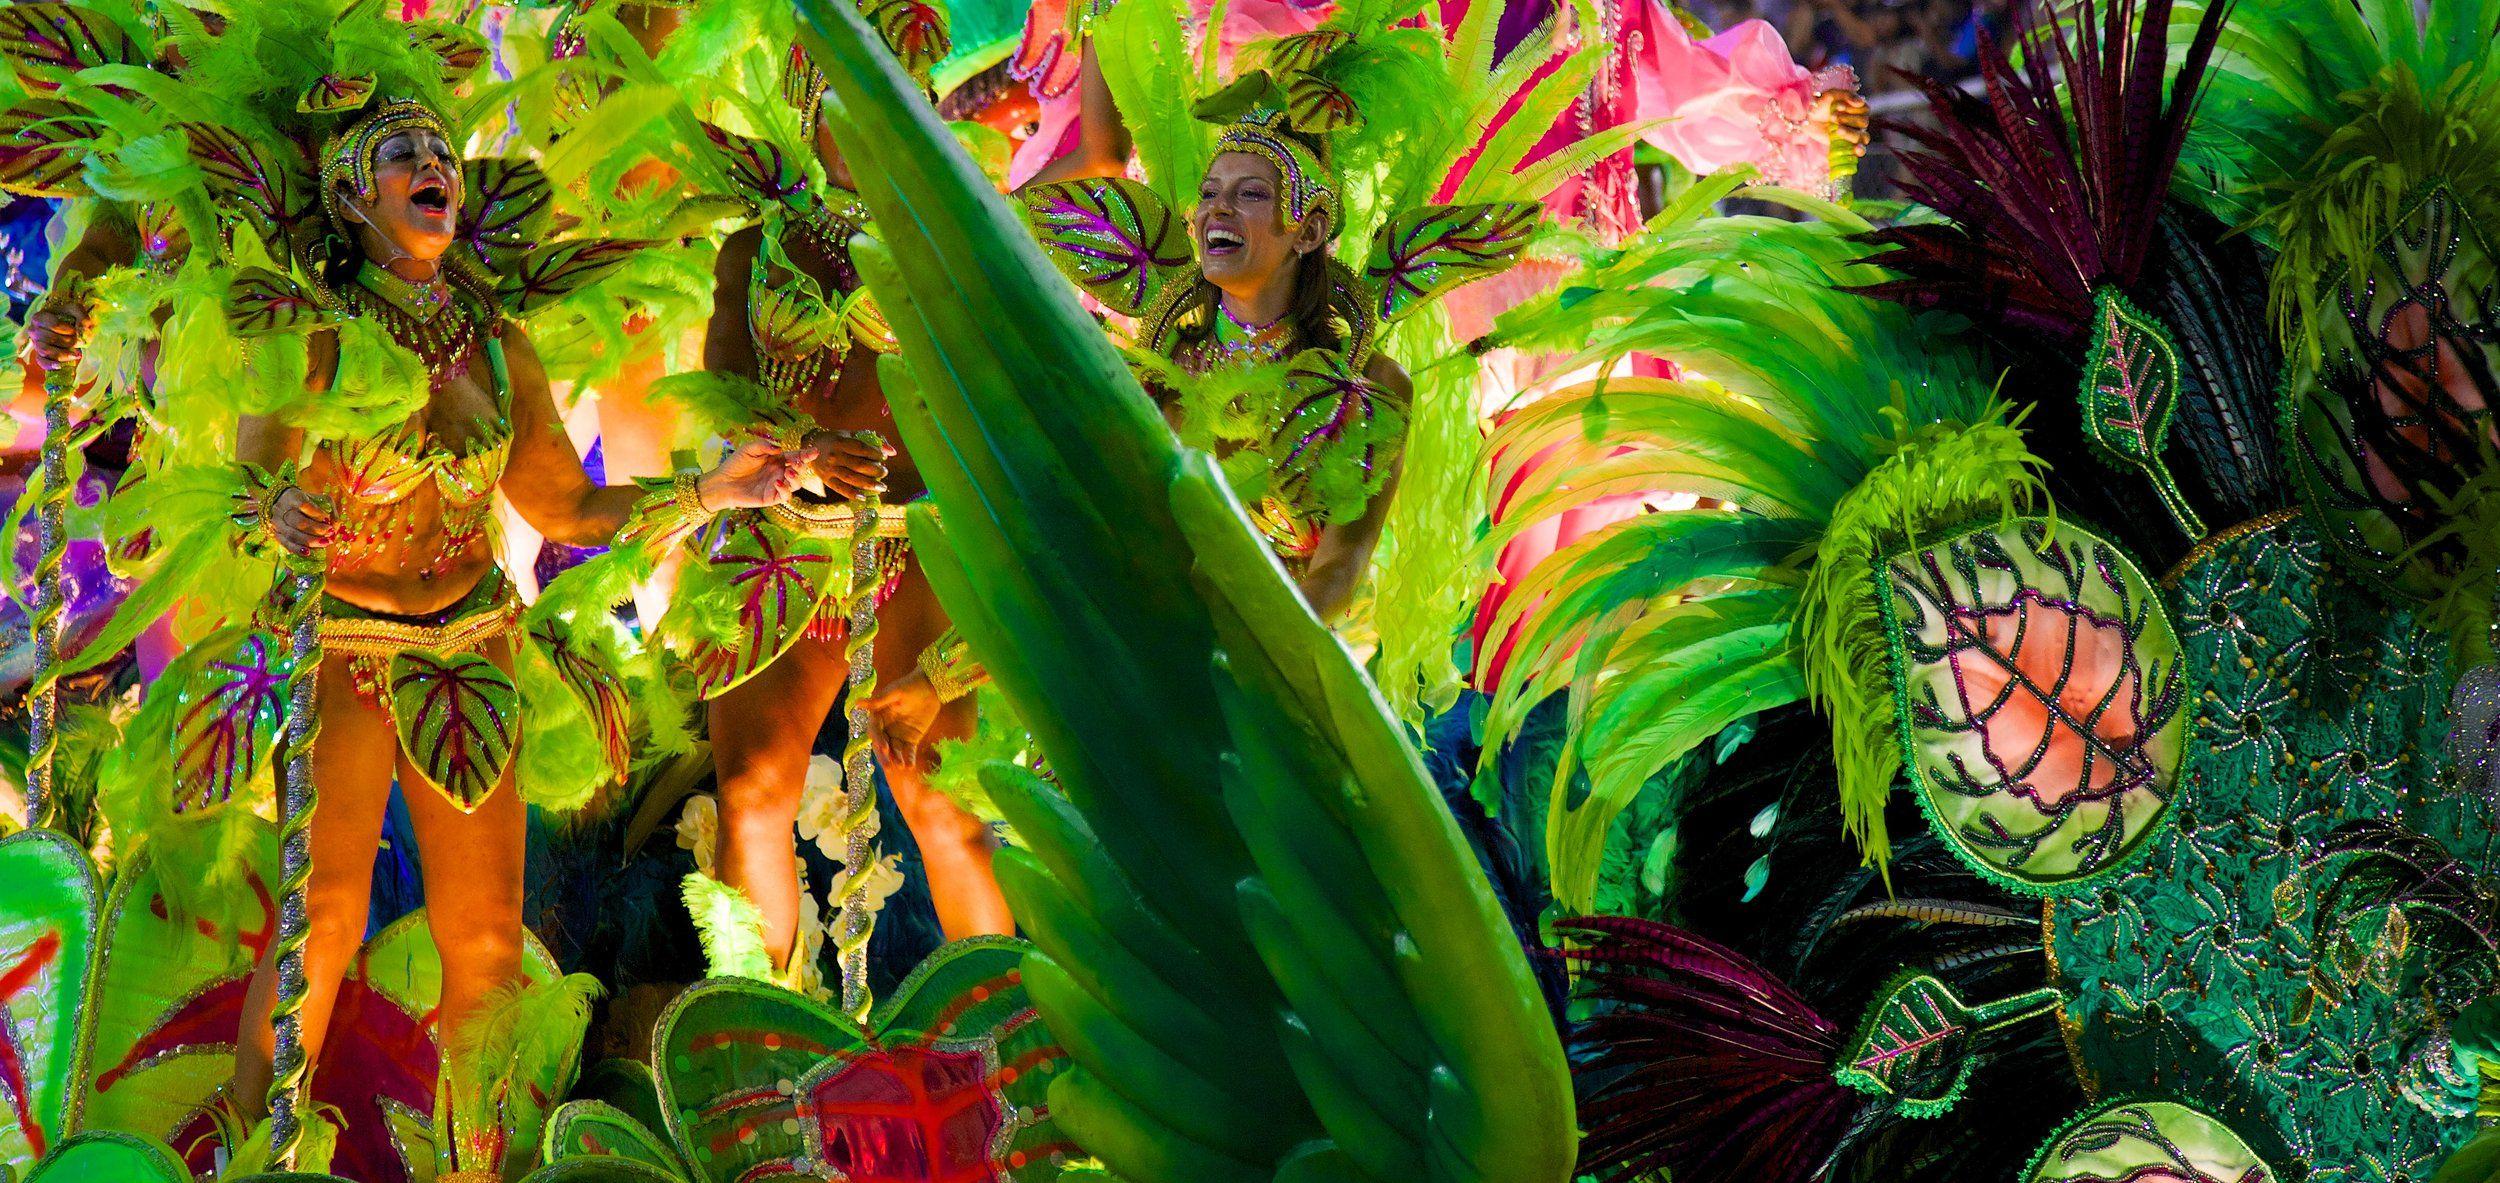 Rio Carnival 2020 With Images Rio Carnival Brazil Carnival